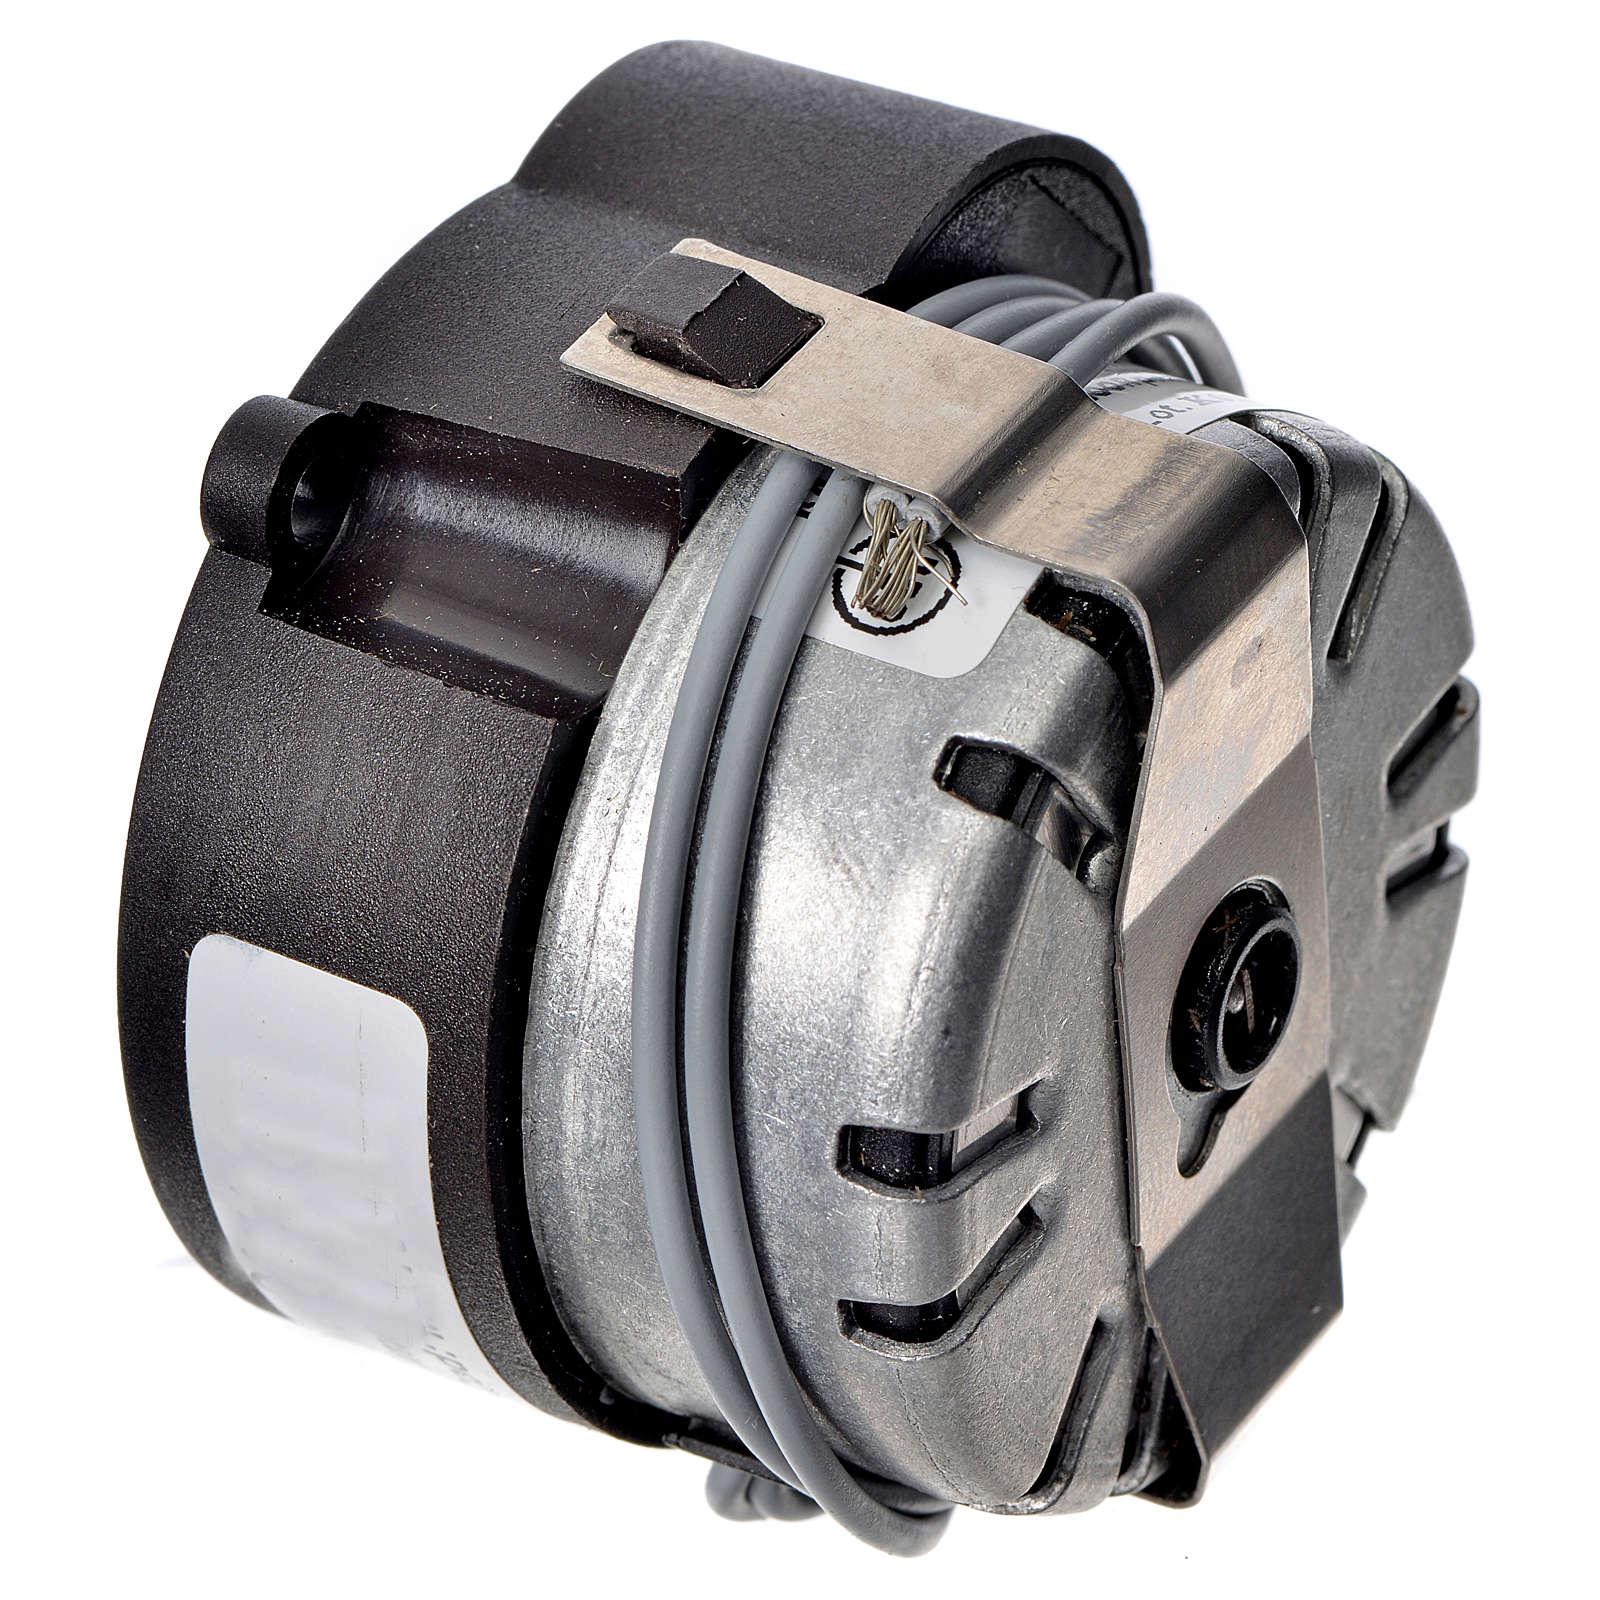 Nativity accessory, MR gear motor, 5 t/m 4